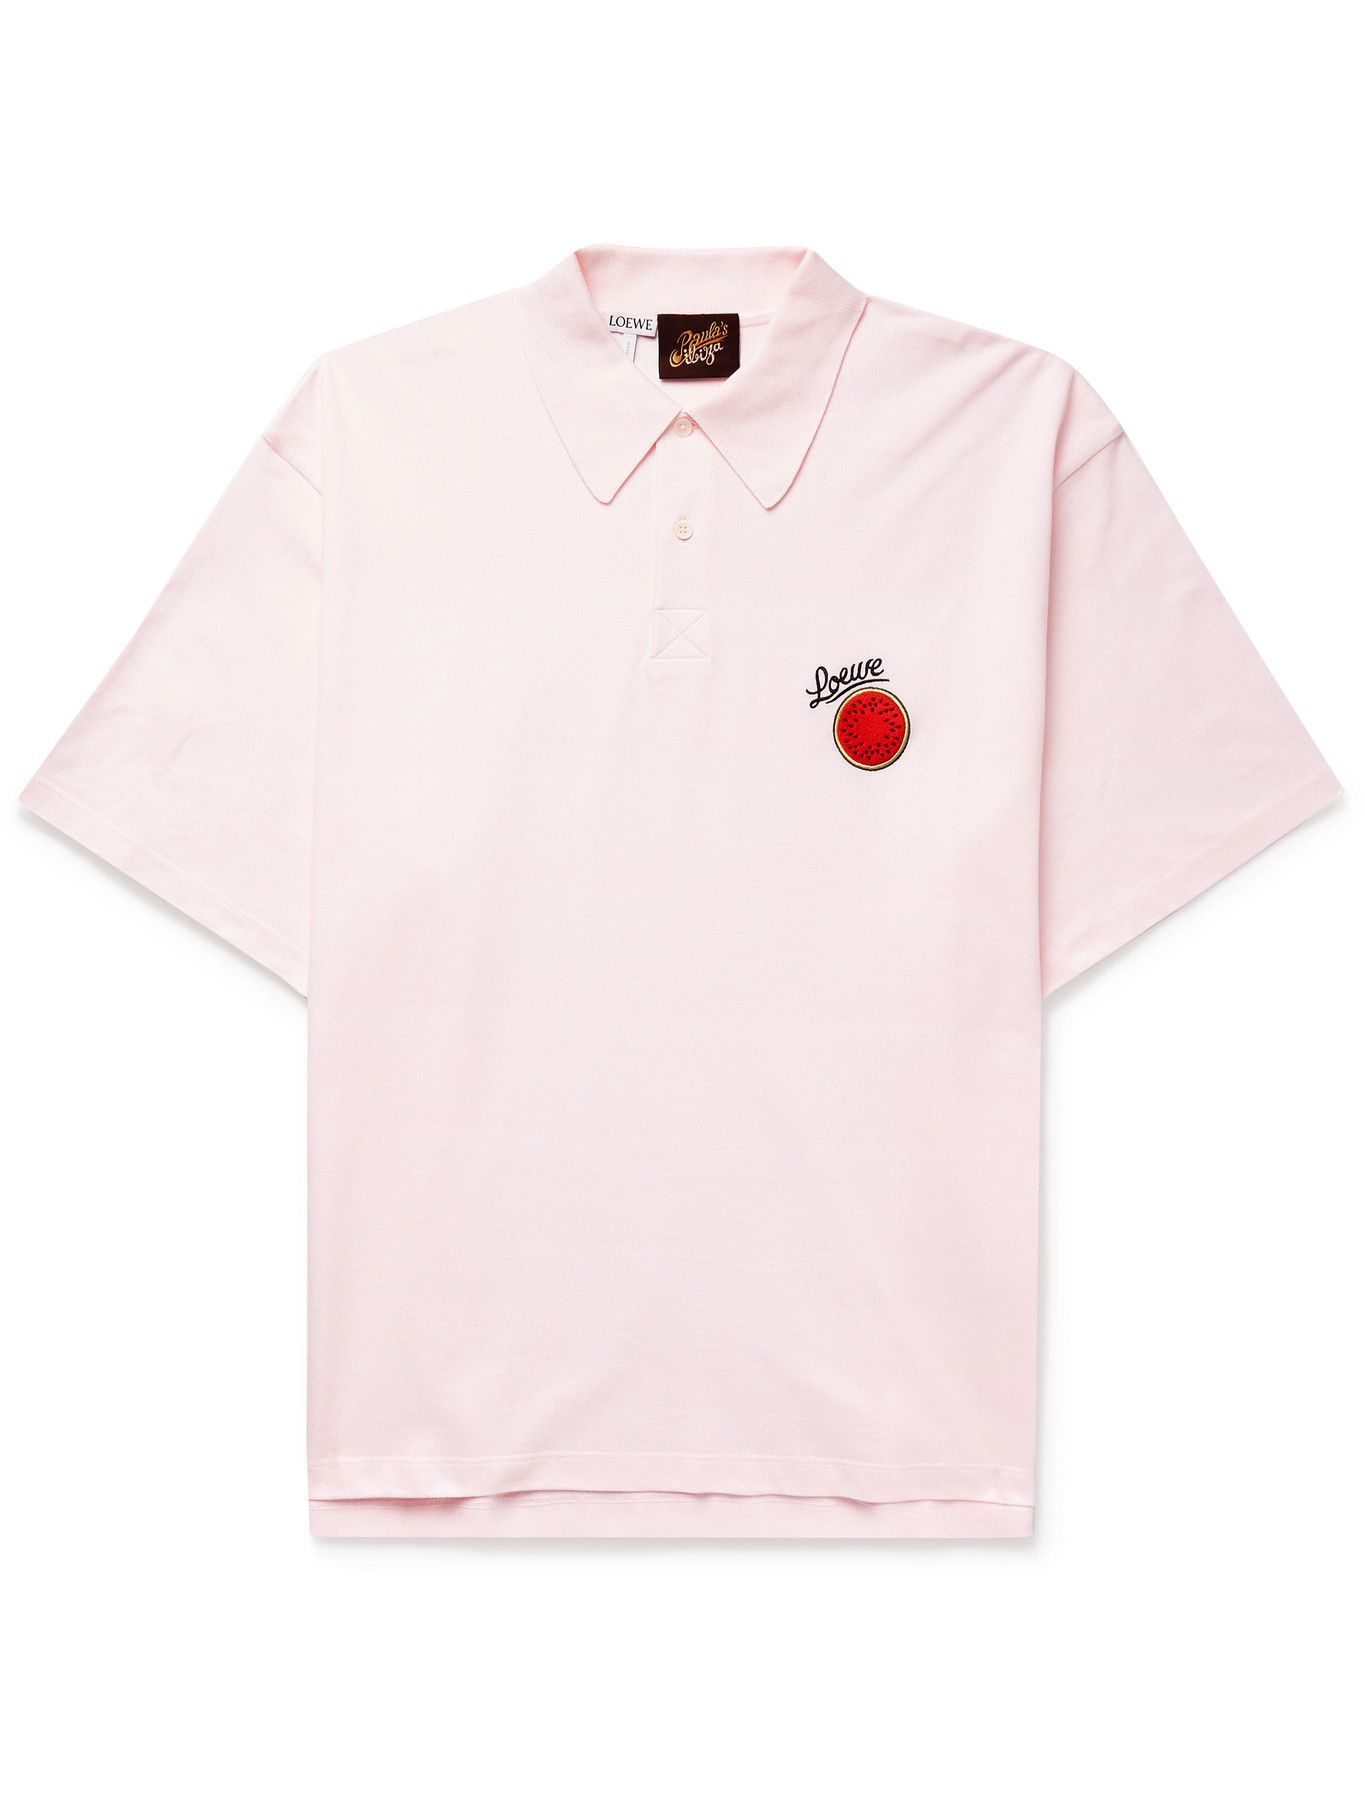 Photo: LOEWE - Paula's Ibiza Oversized Logo-Embroidered Cotton-Piqué Polo Shirt - Pink